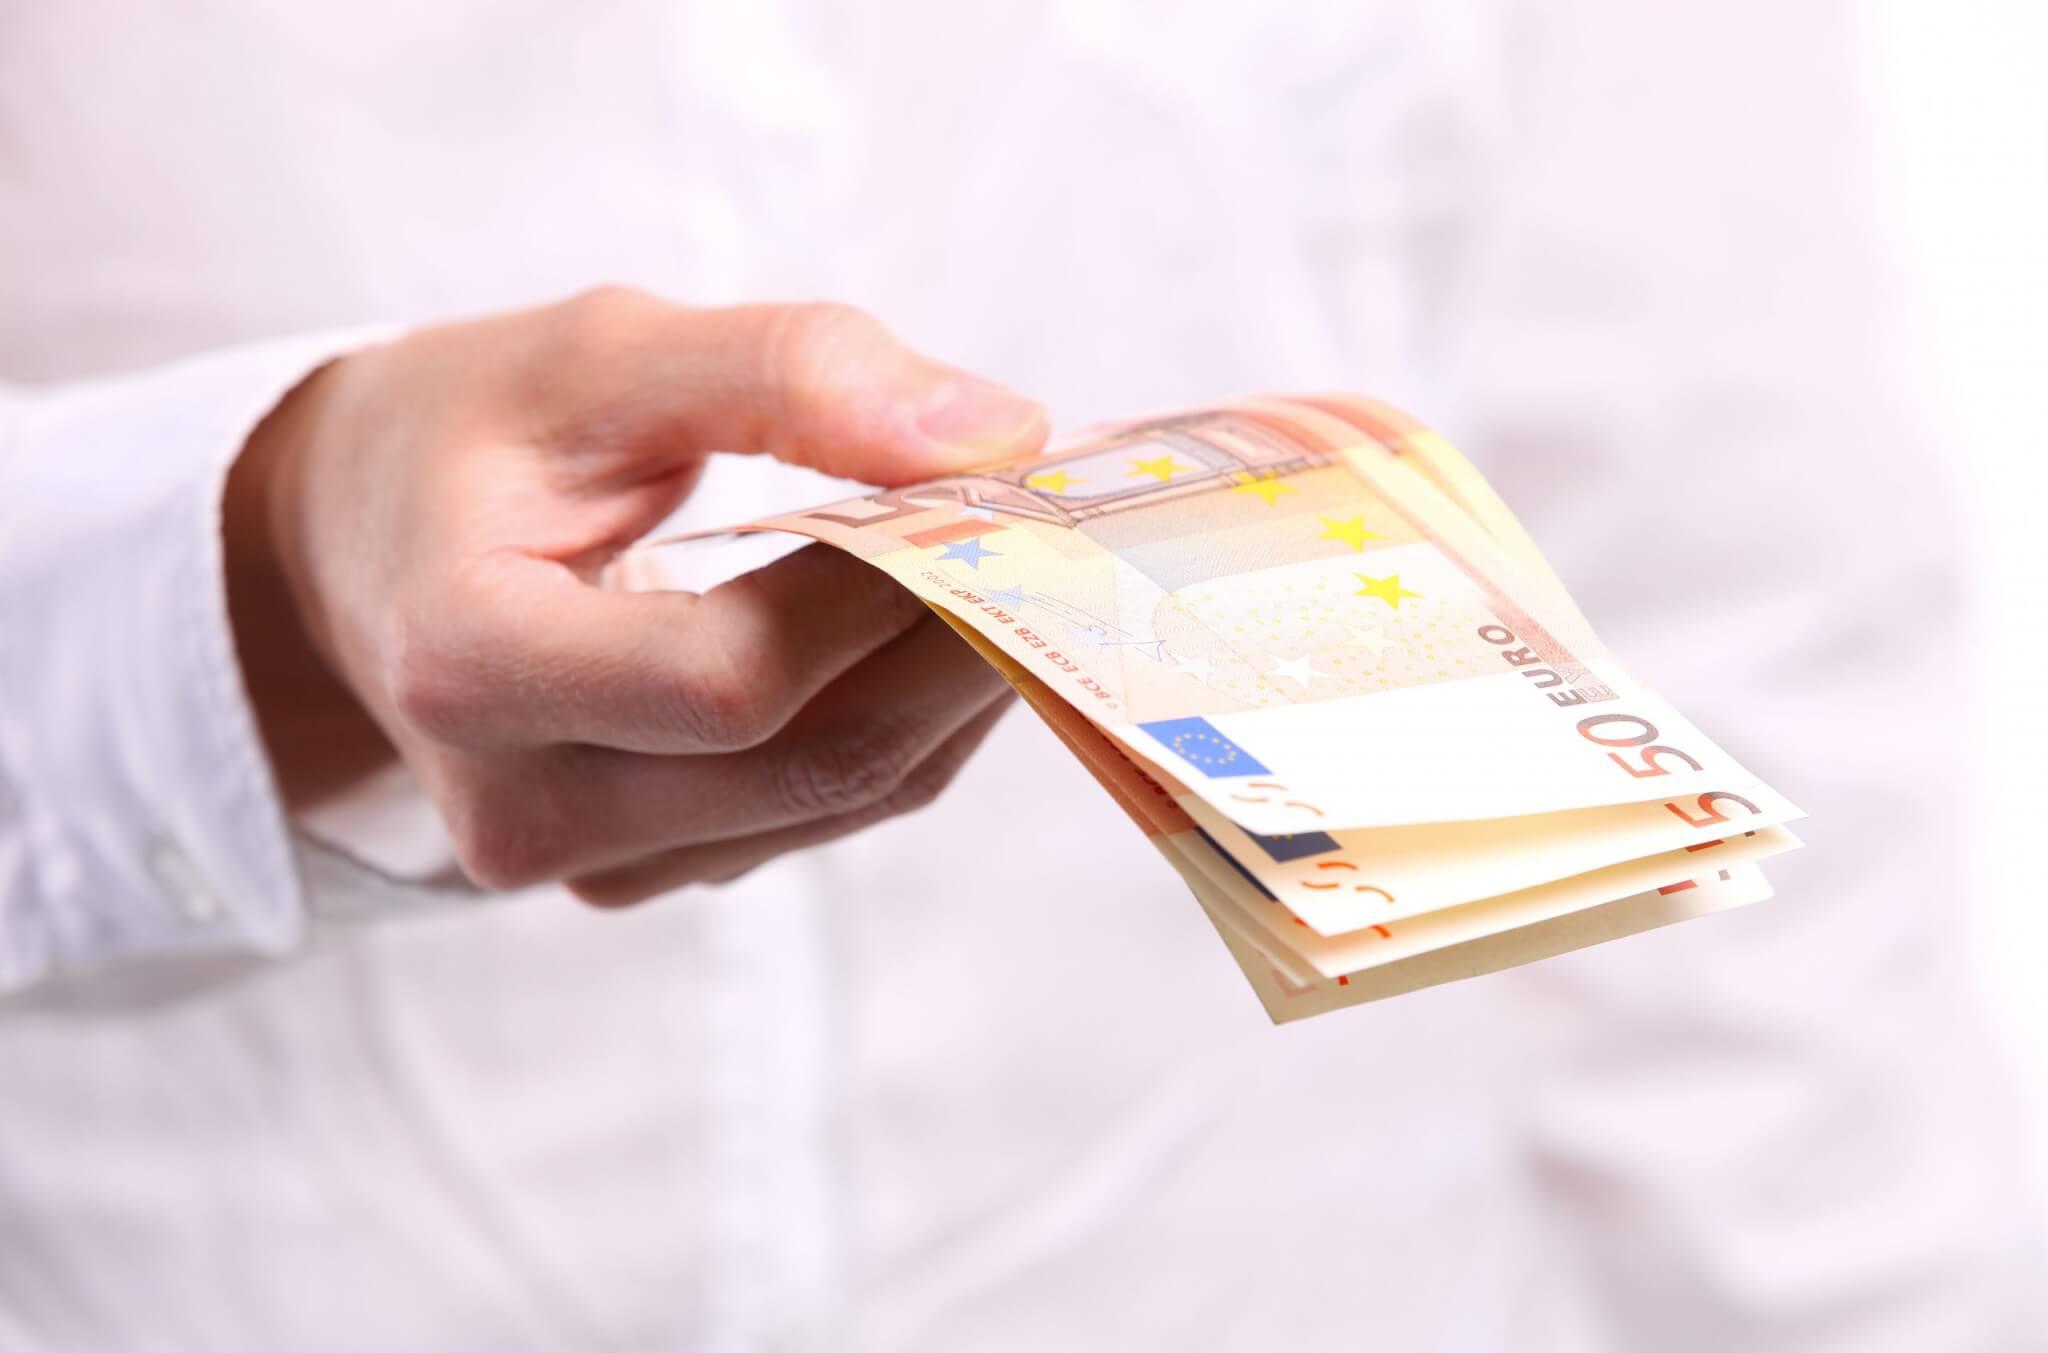 goedkoopste doorlopend krediet